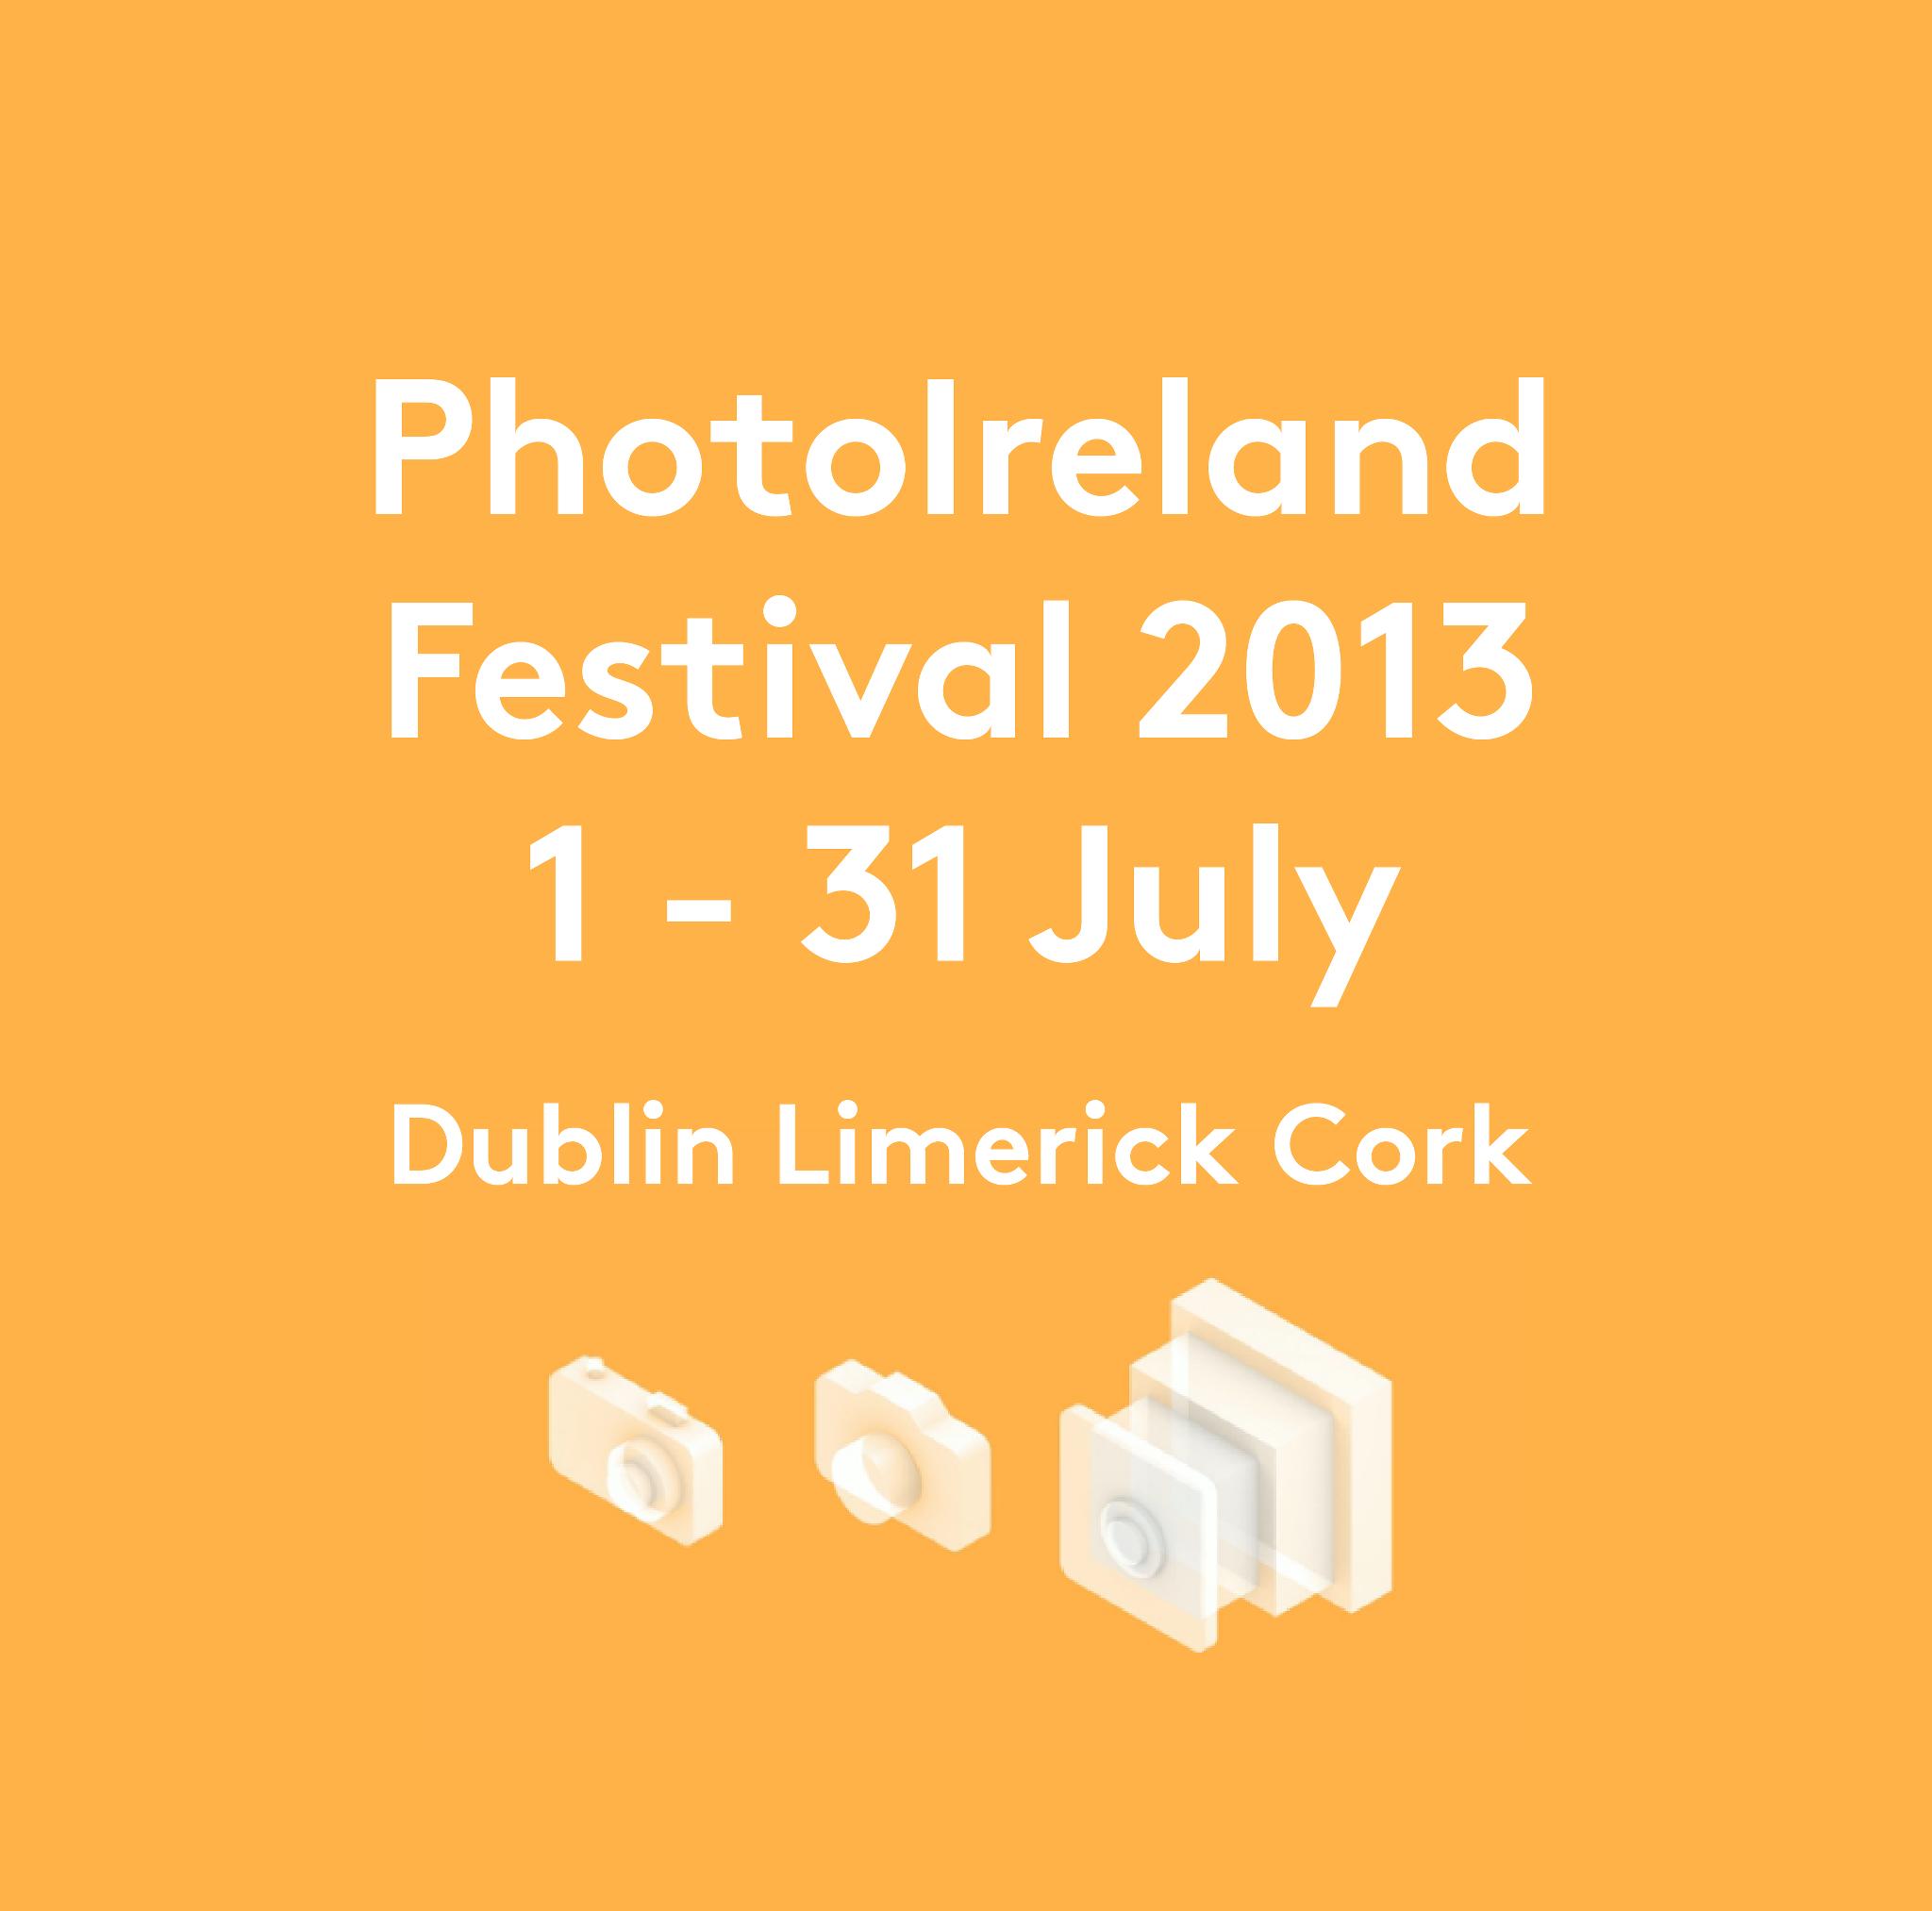 Catalogue for PhotoIreland Festival 2013